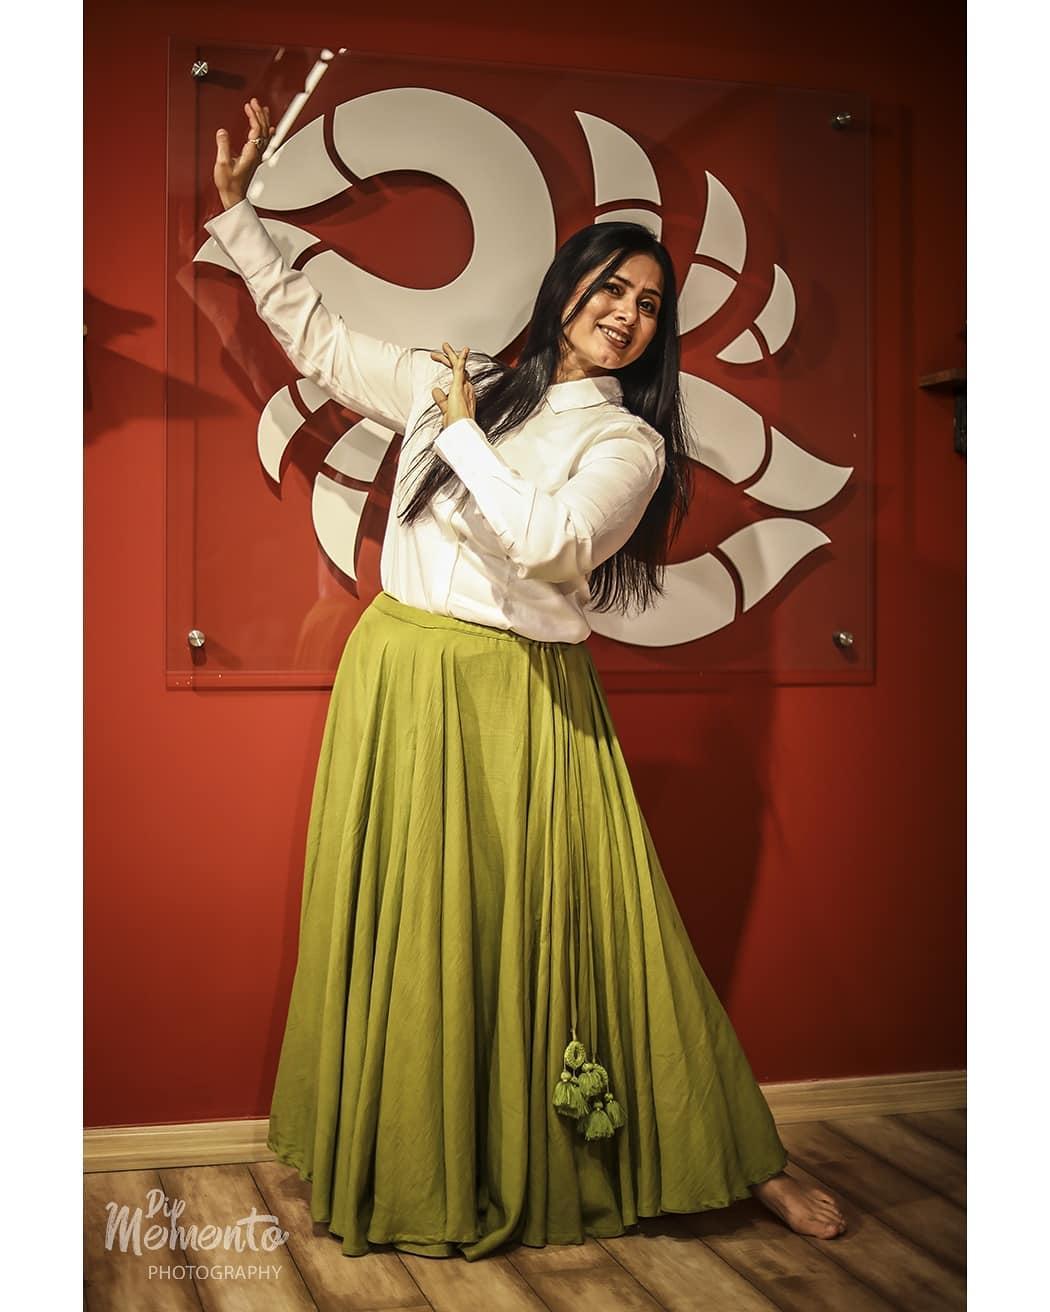 Passion has no expiration date. Juzzz think I can, i will..end of the story.. . . Dance Shoot for  @nrityalayabyjashodapatel @jashodapatel_kathak 📸@dip_memento_photography . .  #kathakdancers #indiandancecrew #bollywooddance #dancersofindia  #kathak #kathakdance #classicaldance #ahmedabad #indianclassicaldance #dancephotography #chakkars #happydancing #classicaldance #indiandancer #dancersofinstagram #indianclassicaldance  #kathakdance #kathakdancer #indianclassicaldancers #9924227745 #dipmementophotography  #worldofdance #dance #indiandanceform #loveforkathak #dancers #dancersindia #indiaportraits